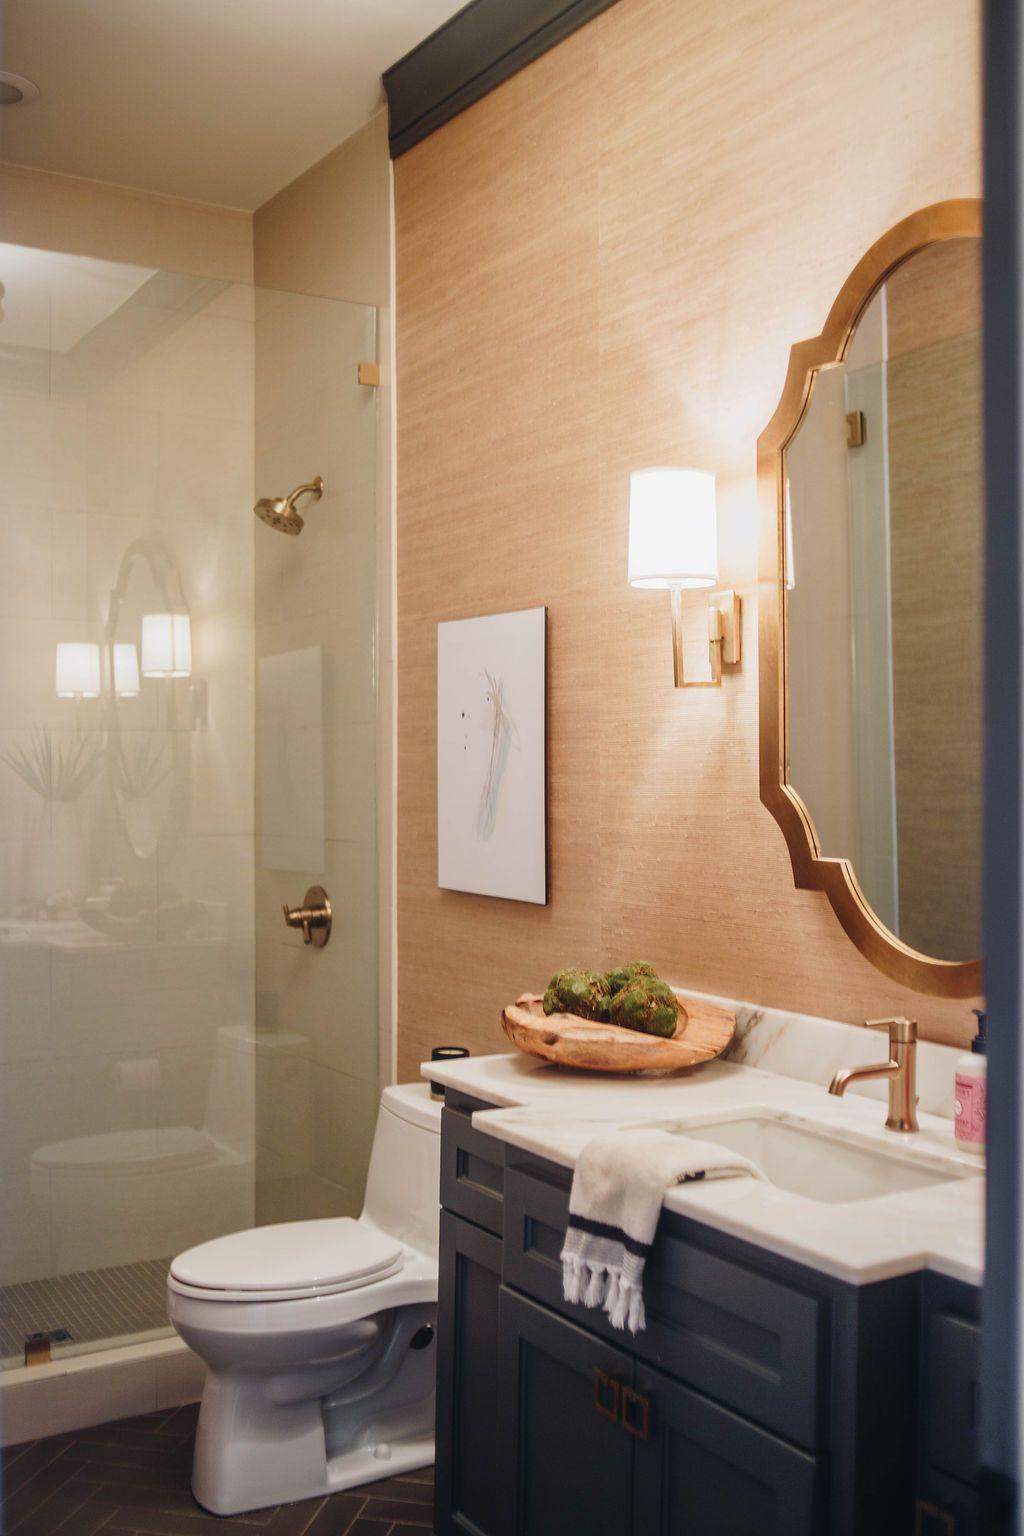 Chic Guest Bathroom Decor Ideas Guest Bathrooms Bathroom